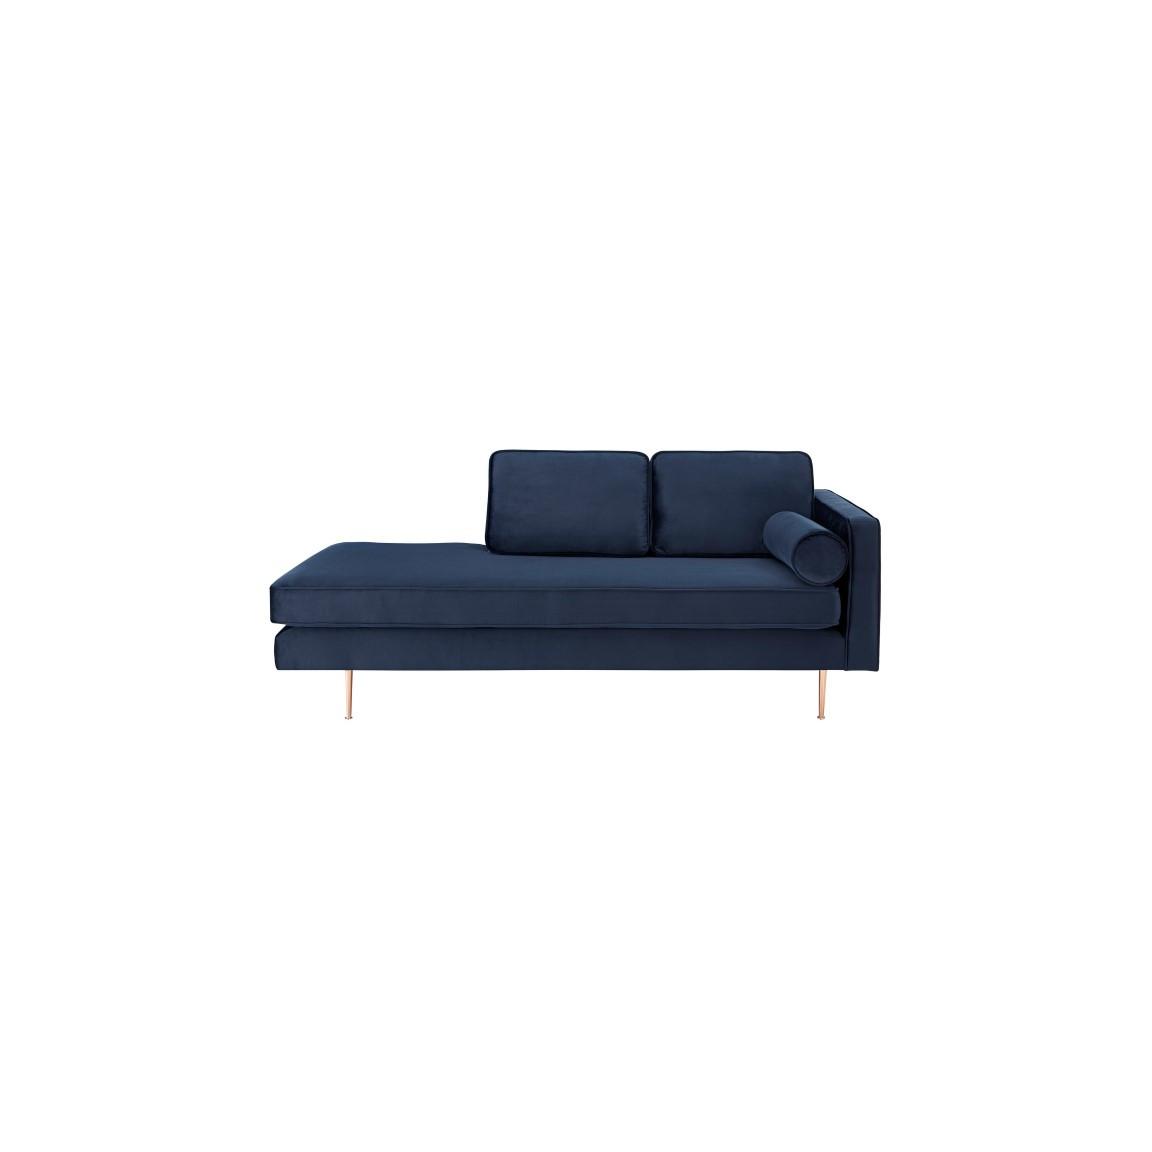 2-Sitzer-Sofa Rechts Eleonore | Blau